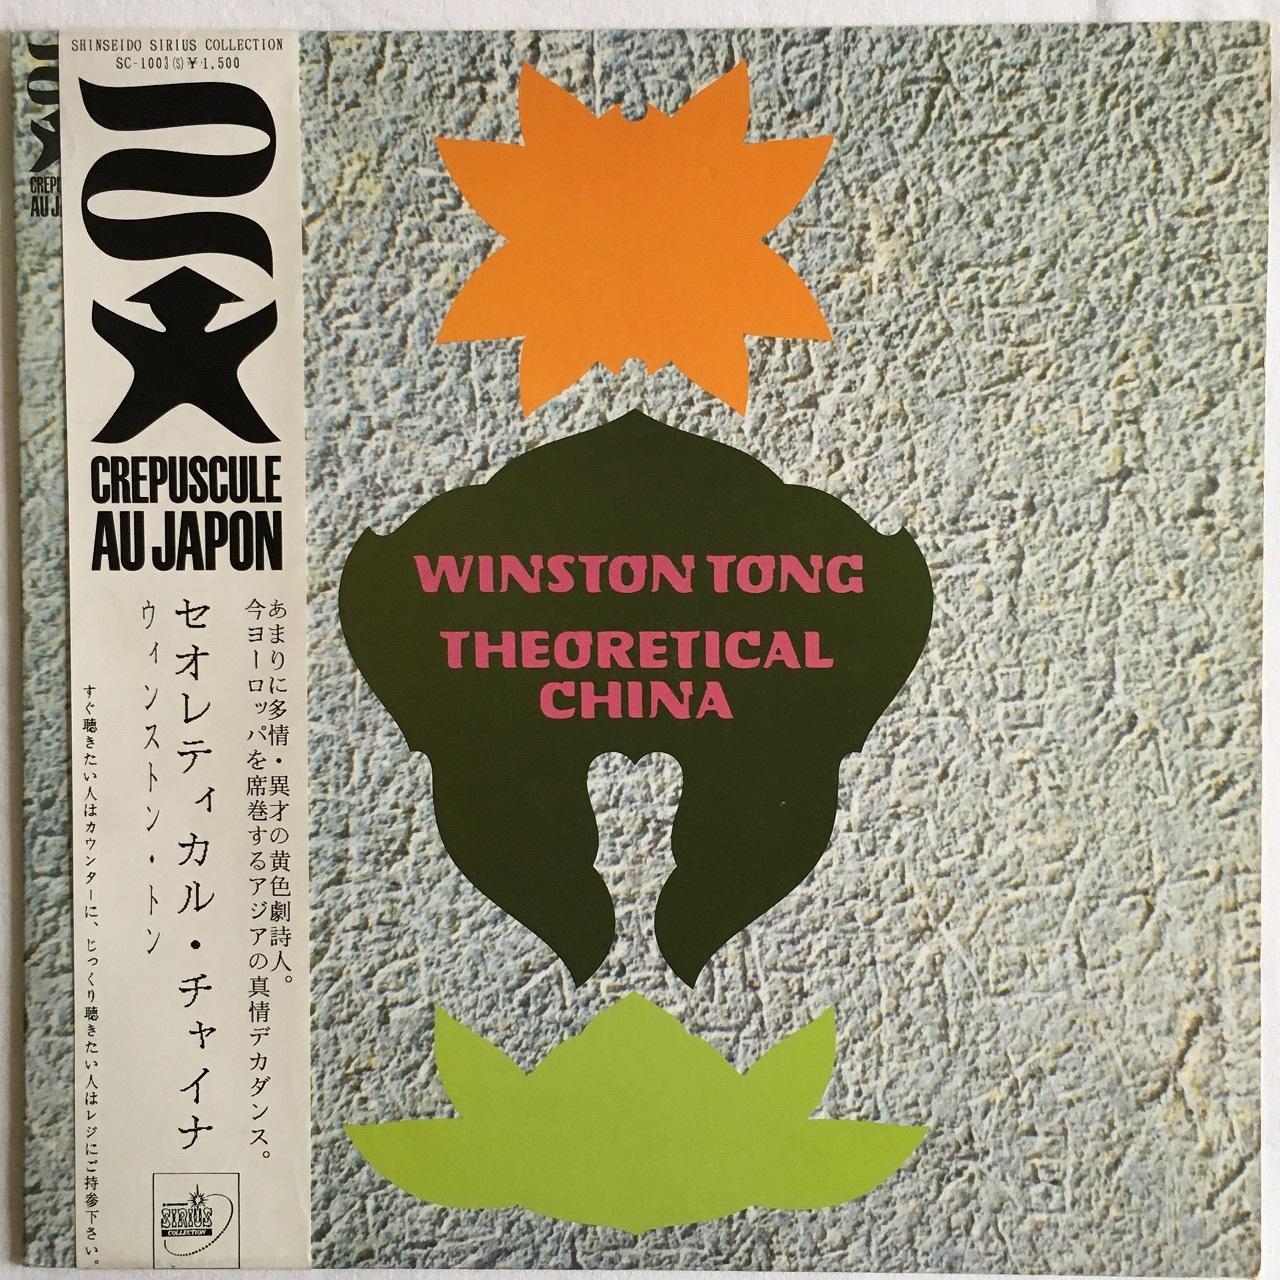 【12inch・国内盤】ウィンストン・トン / セオレティカル・チャイナ